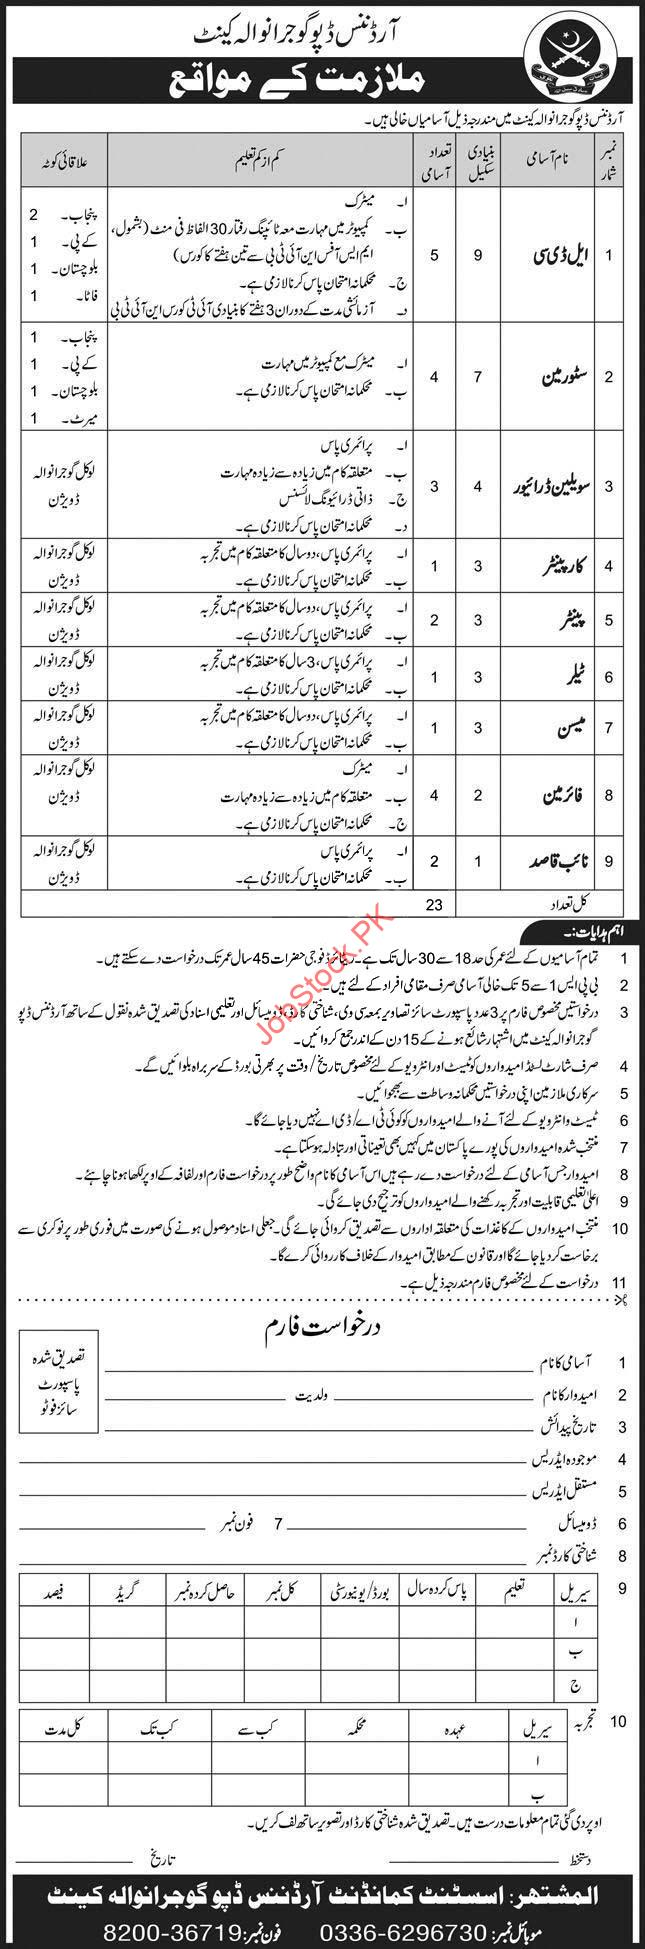 Ordnance Depot Gujranwala Cantt Jobs 2020 November Latest